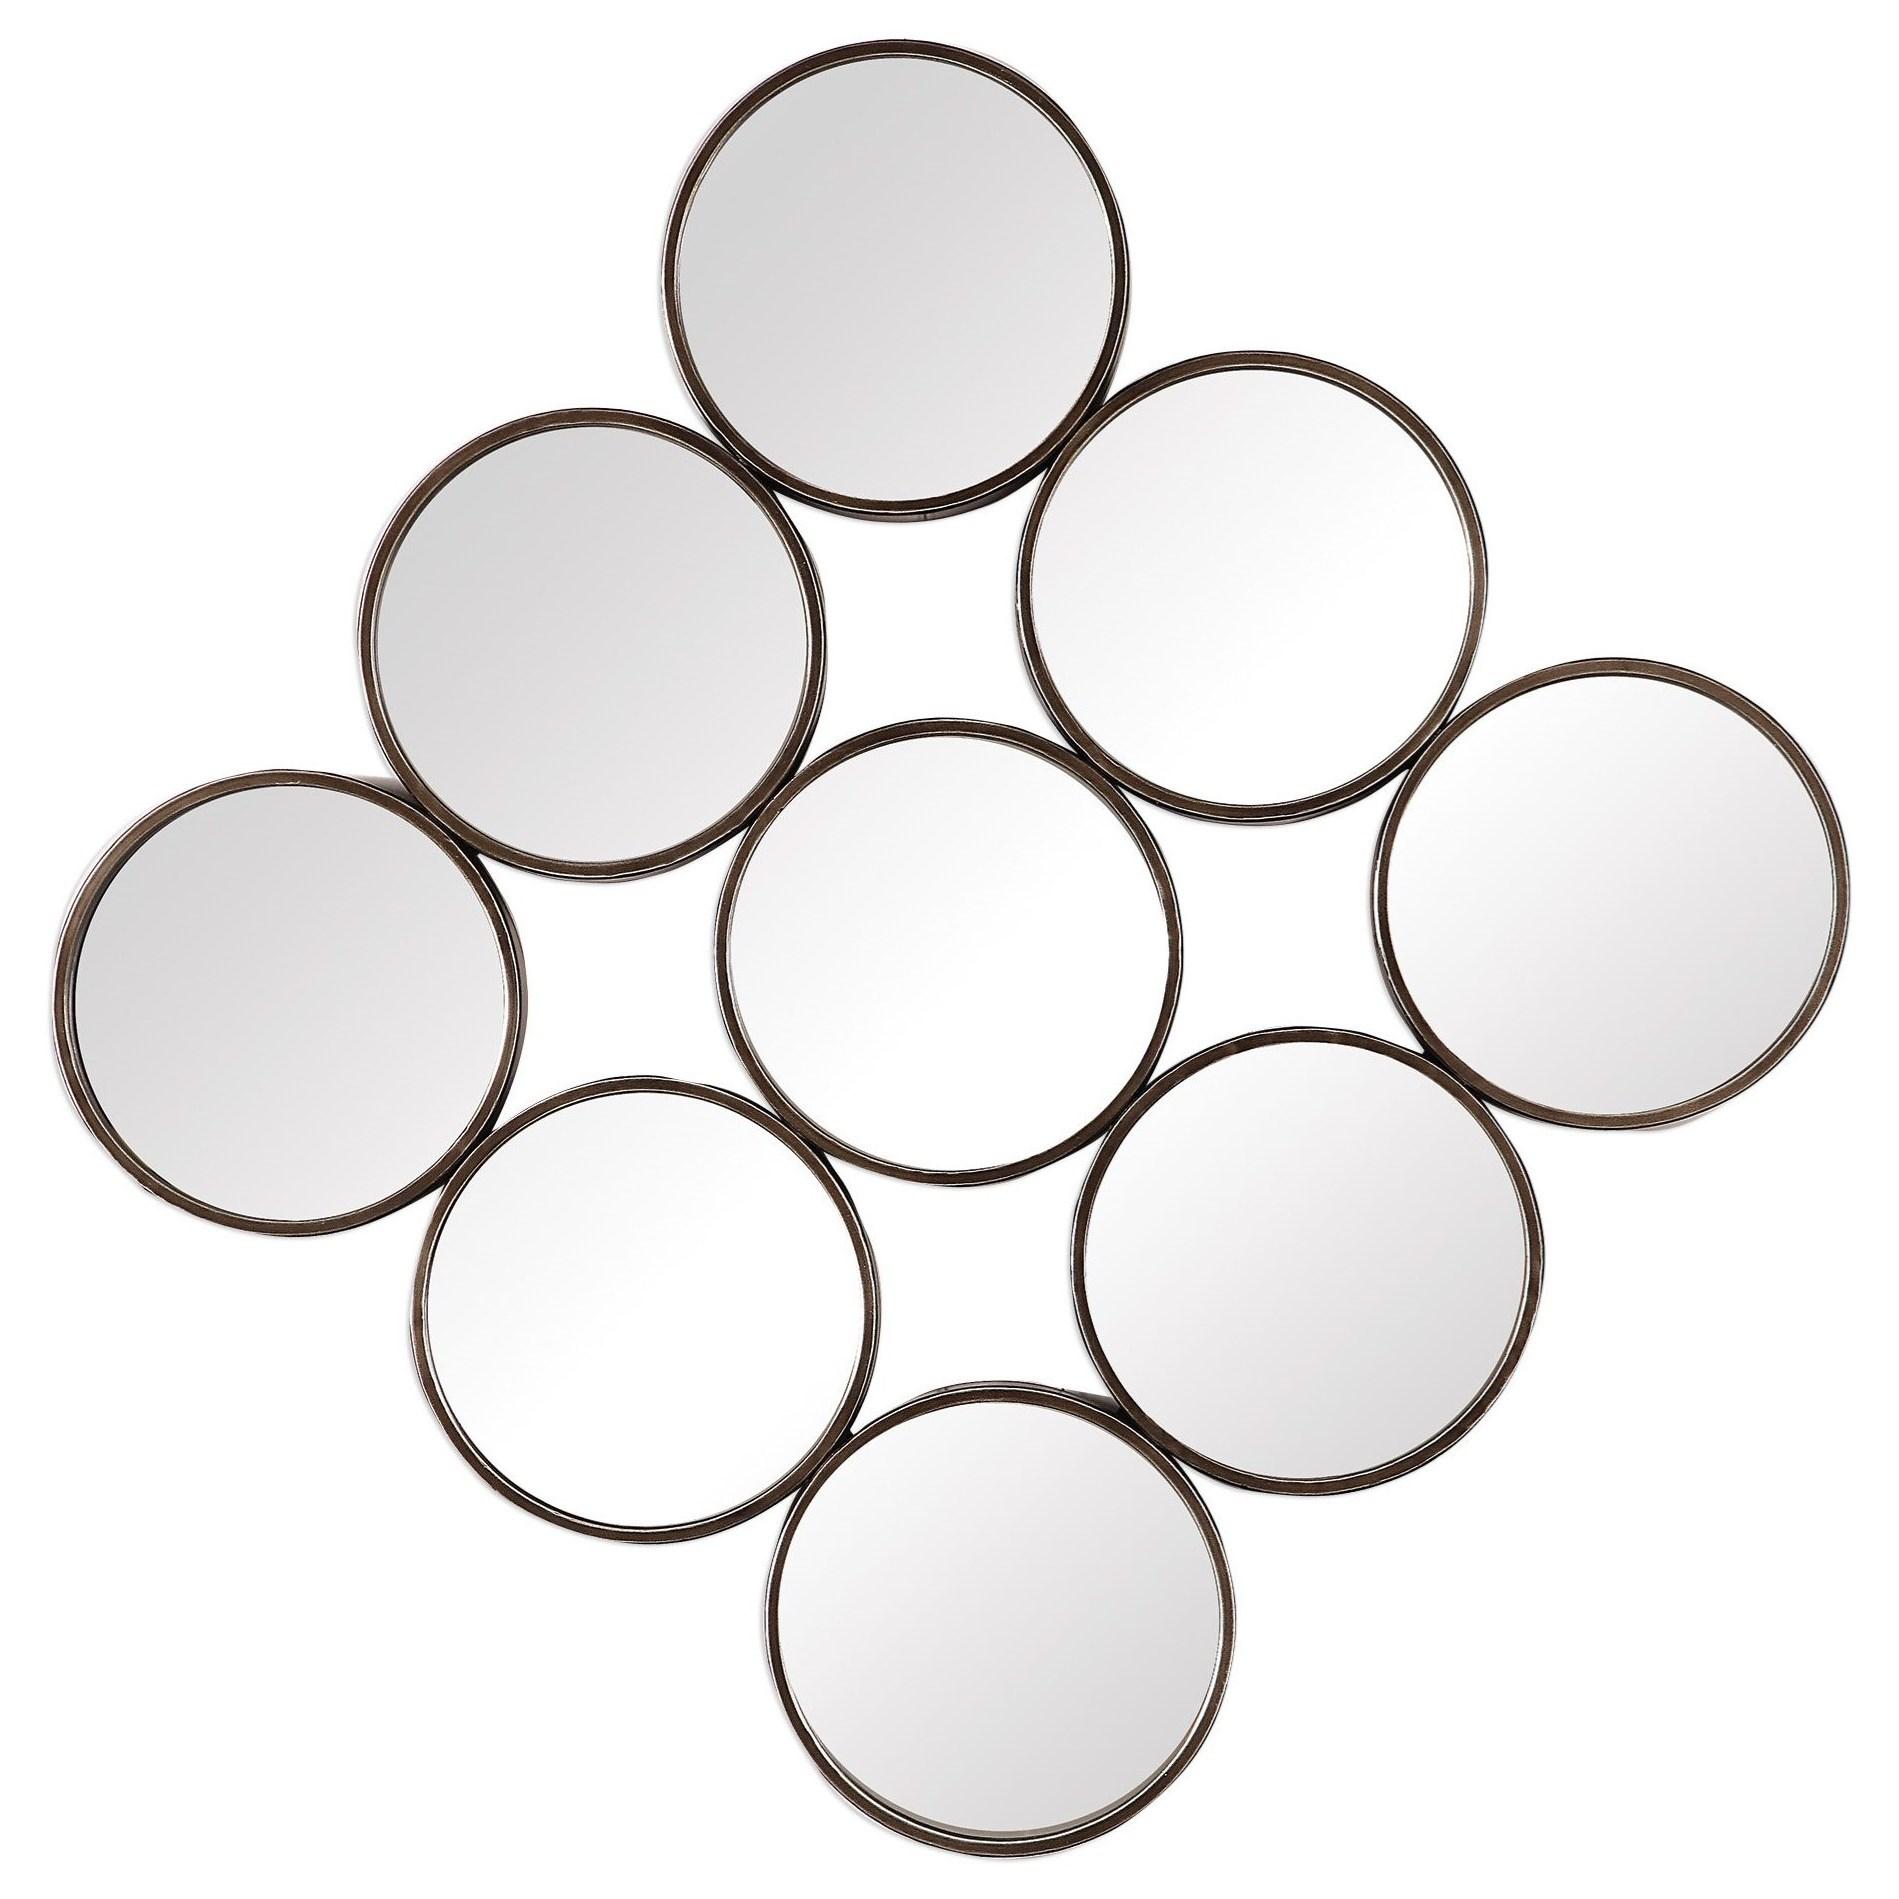 Mirrors - Round Devet Welded Iron Rings Mirror by Uttermost at Mueller Furniture